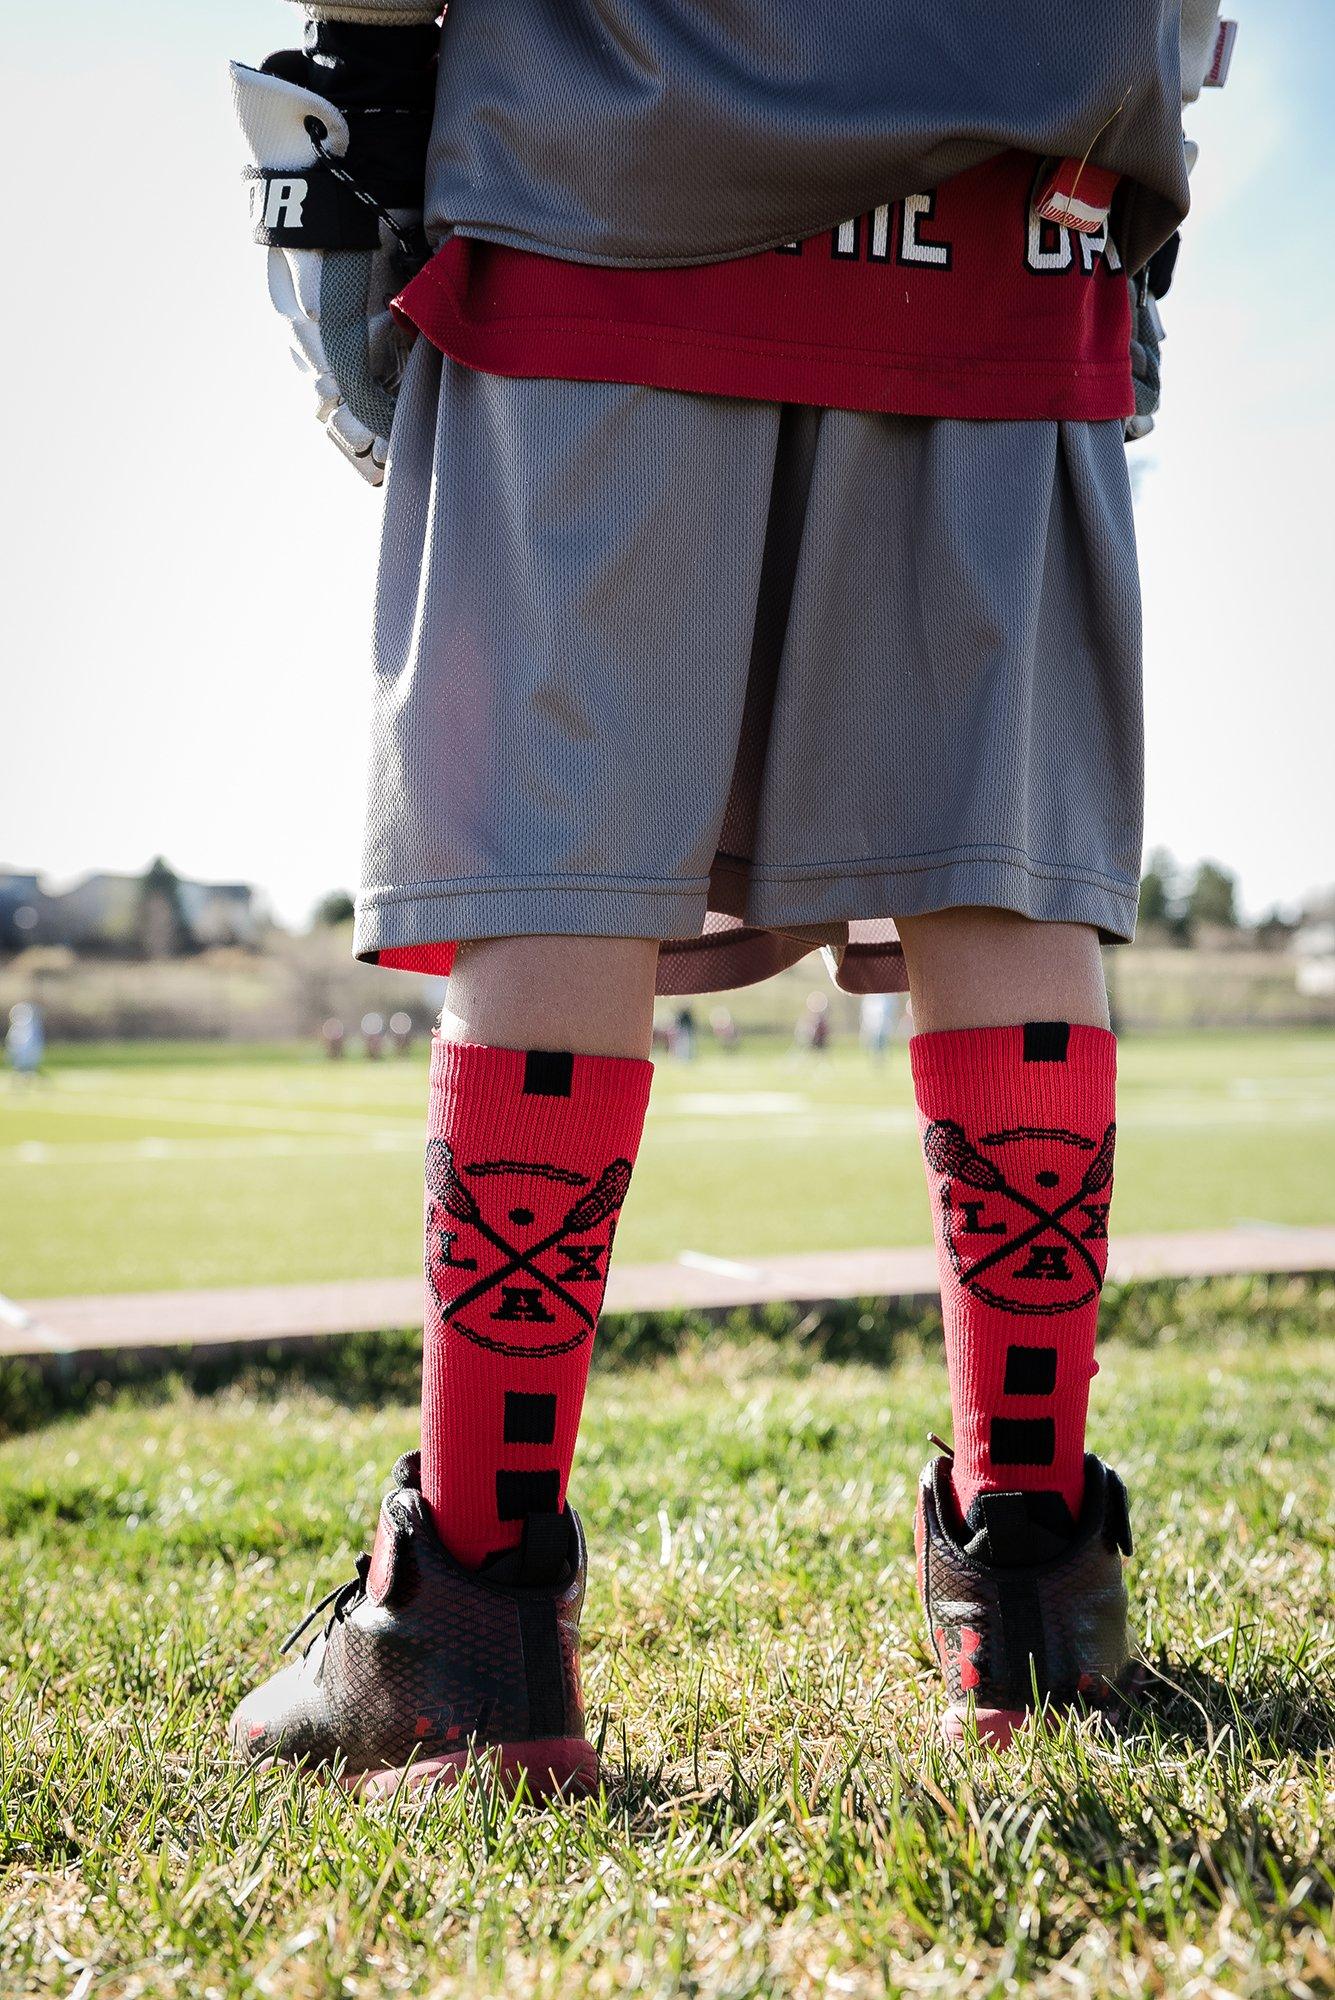 MadSportsStuff LAX Lacrosse Socks Lacrosse Sticks Athletic Crew Socks (Black/White, Large) by MadSportsStuff (Image #5)